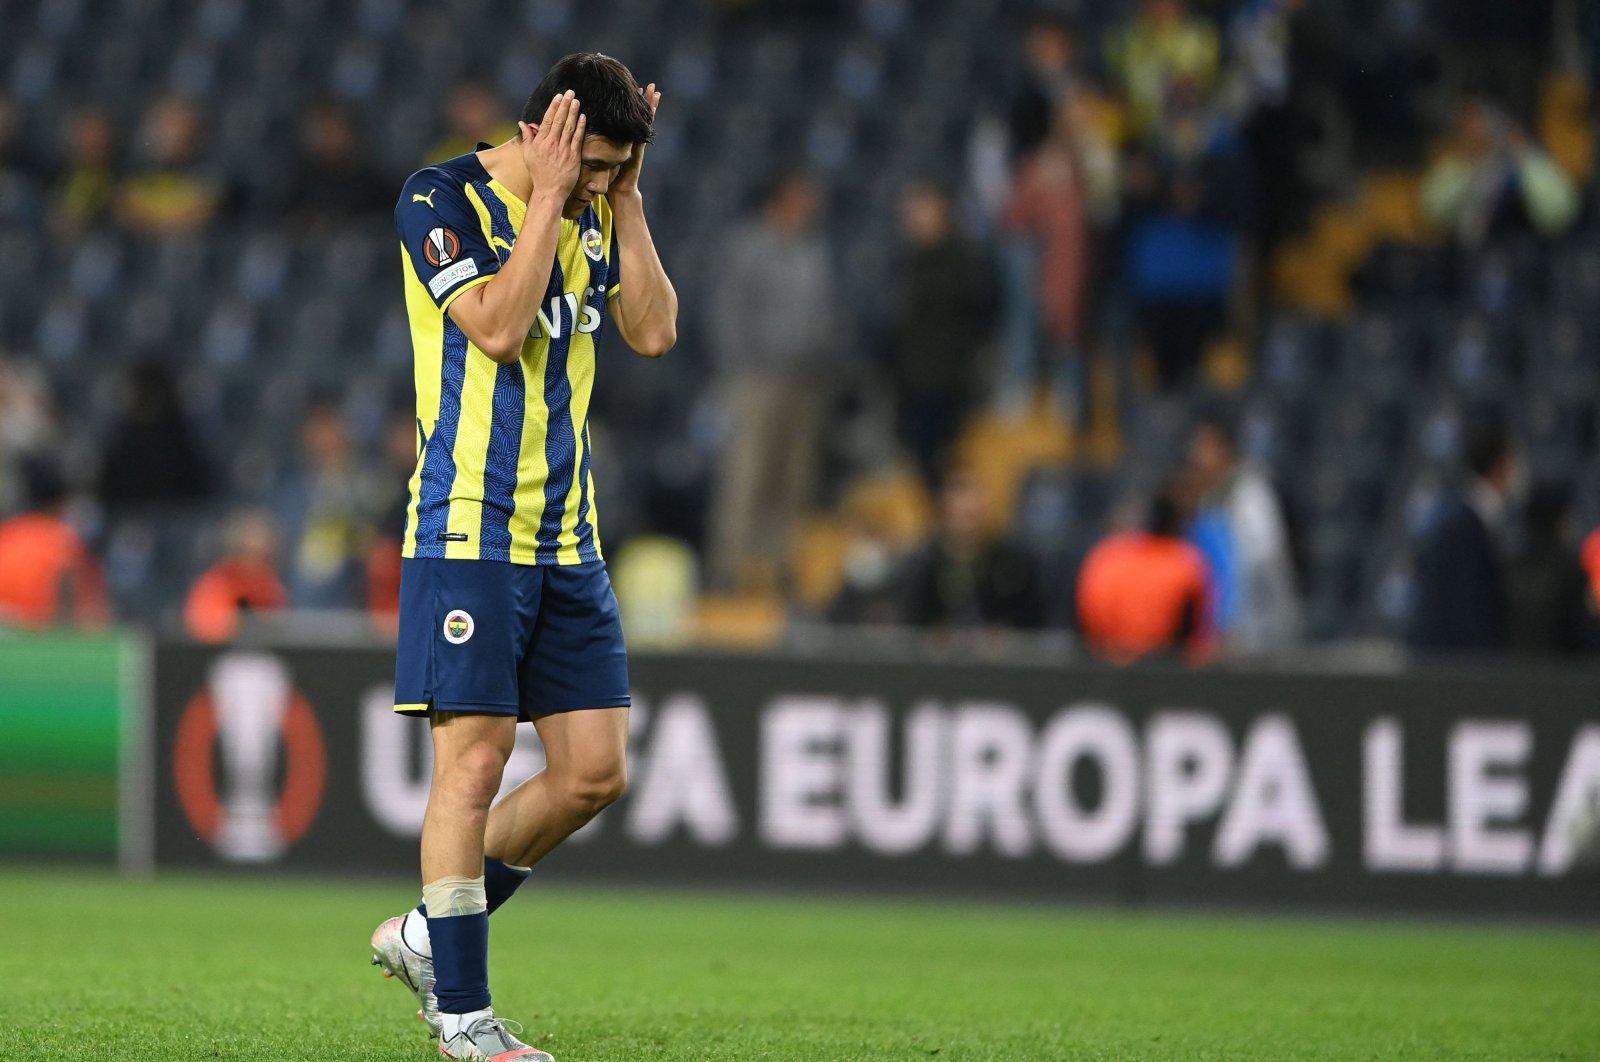 Fenerbahçe's Minjae Kim reacts at the end of a Europa League match against Olympiakos at Şükrü Saraçoğlu Stadium, in Istanbul, Turkey, Sept. 30, 2021. (AFP Photo)